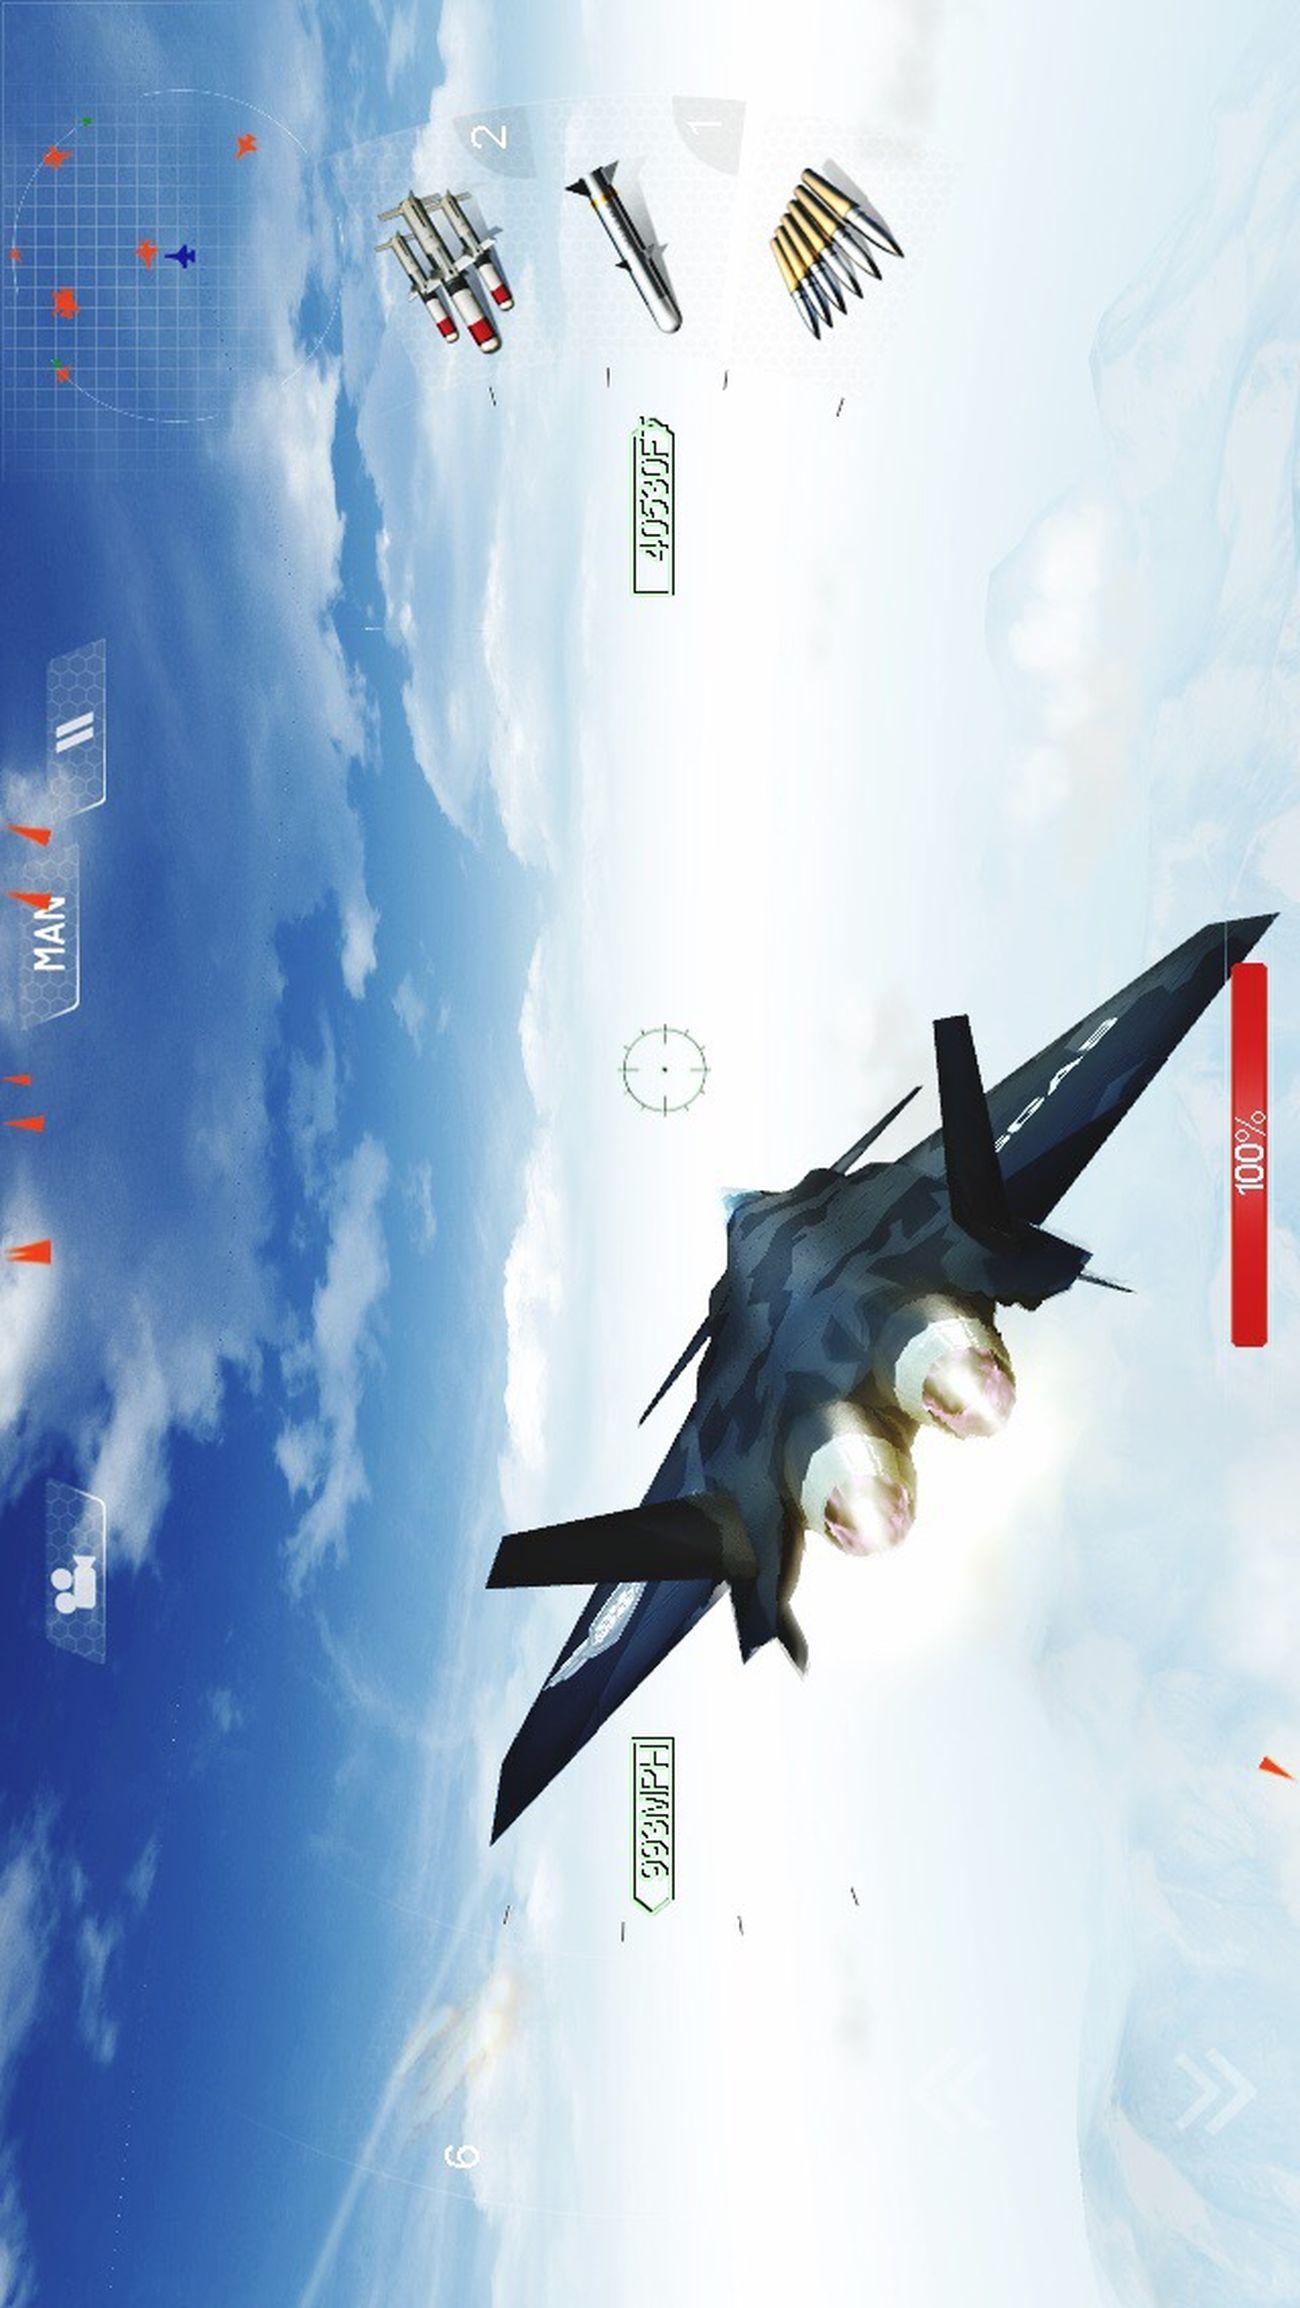 J20 Fighter Plane Fighterplane Game Sky Collection EyeEm Games 好消息好消息 j20提前加入共和国空军序列 现正赶往南海海域迎战霸天虎